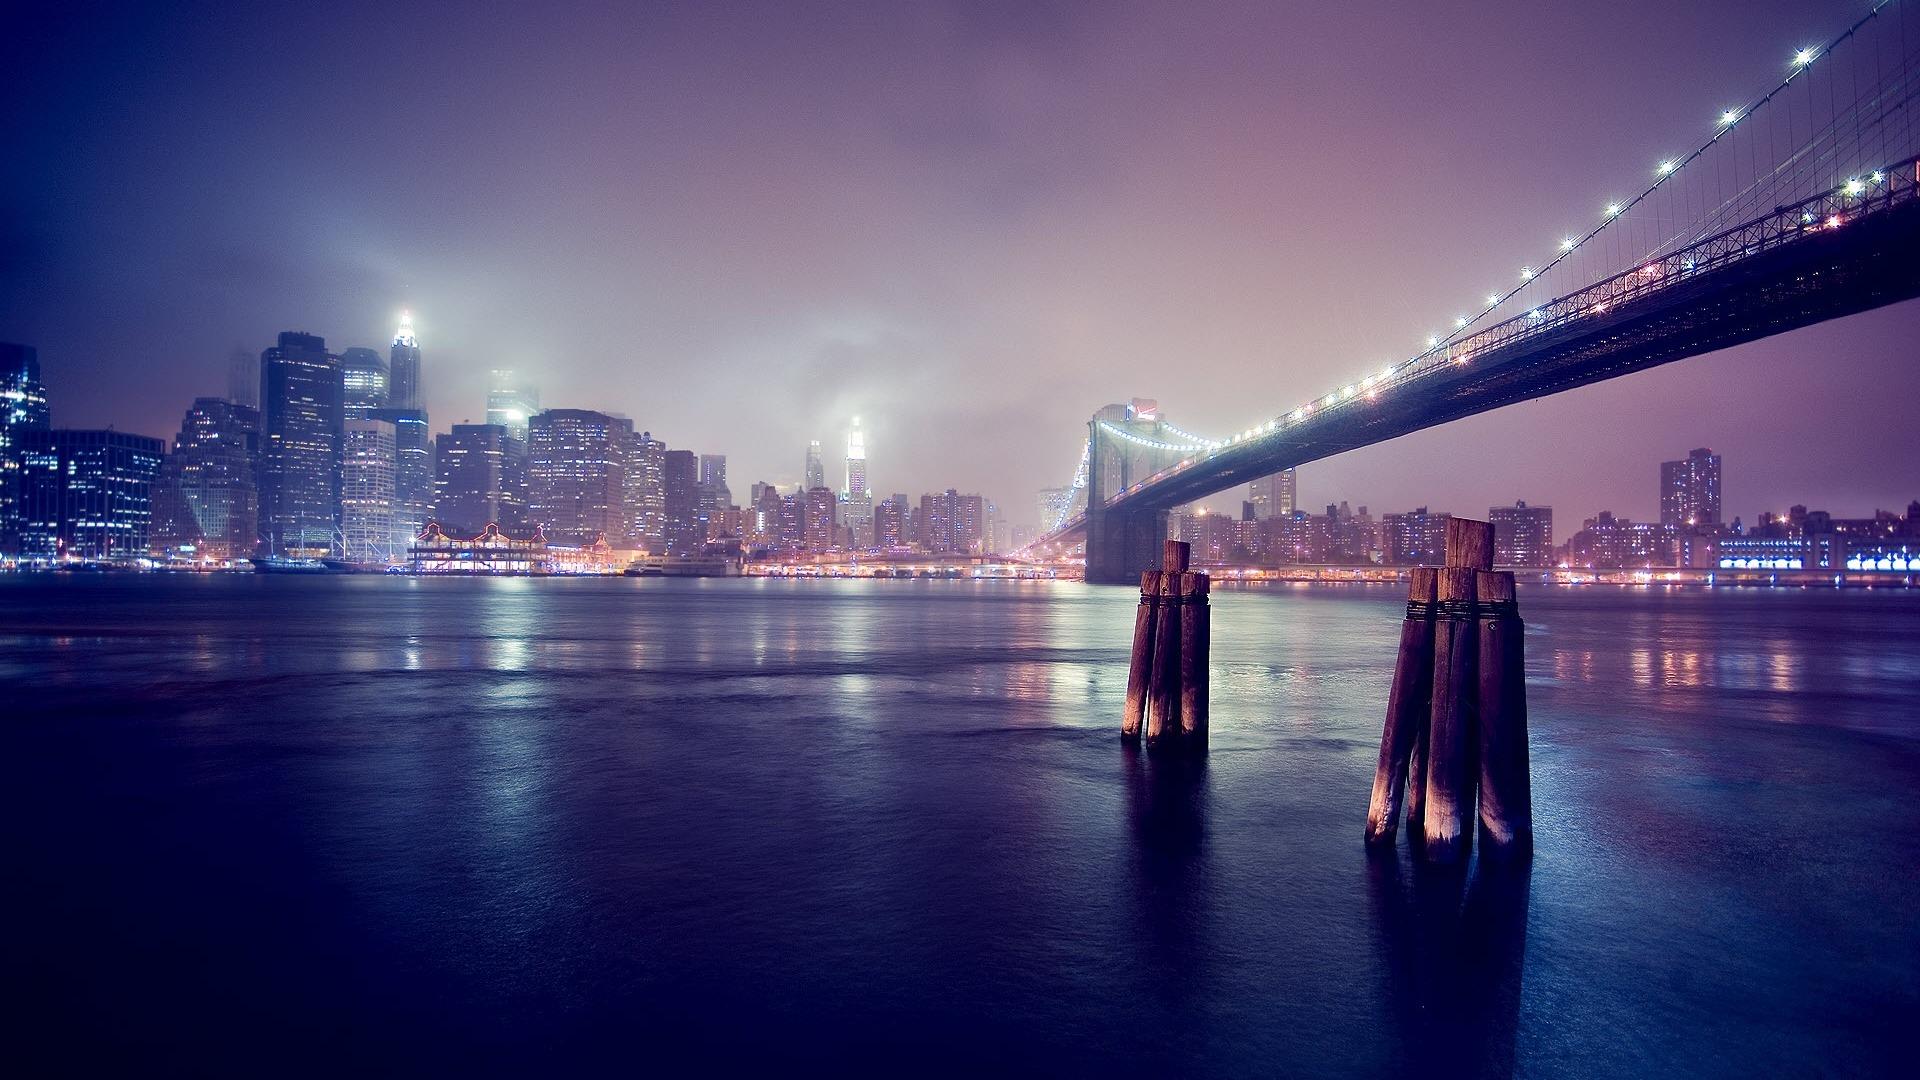 Interesting Wallpaper City Beautiful Citys Hongkong Night Photography Desktop 1920x1080px